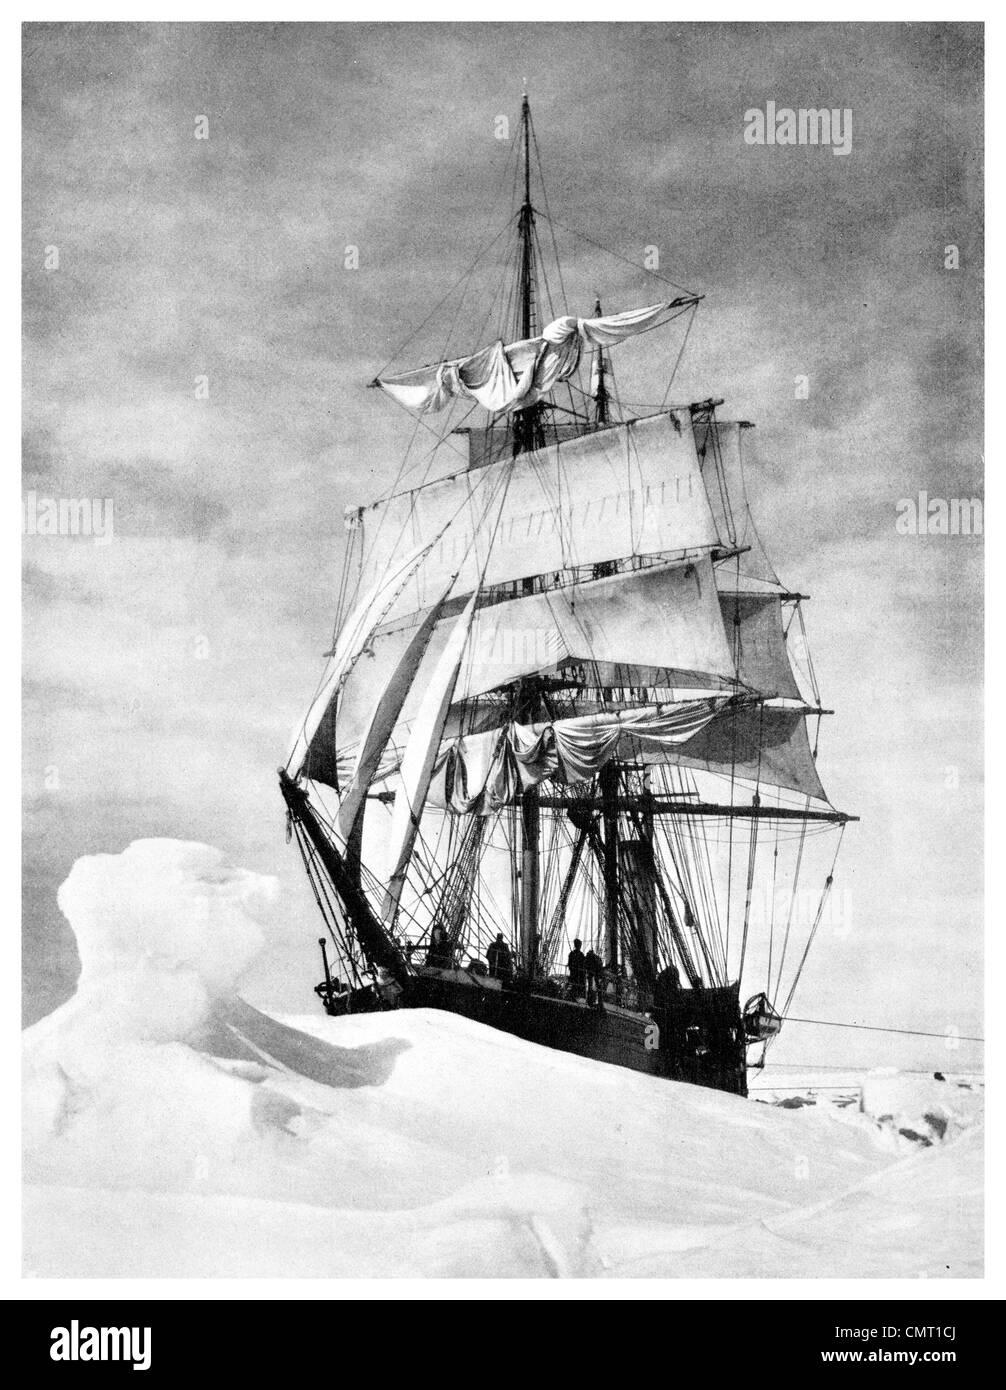 1924 Polar Explorer Terra Nova Captain Scott Terra-Nova-Expedition, offiziell die britische Antarktis-Expedition Stockbild